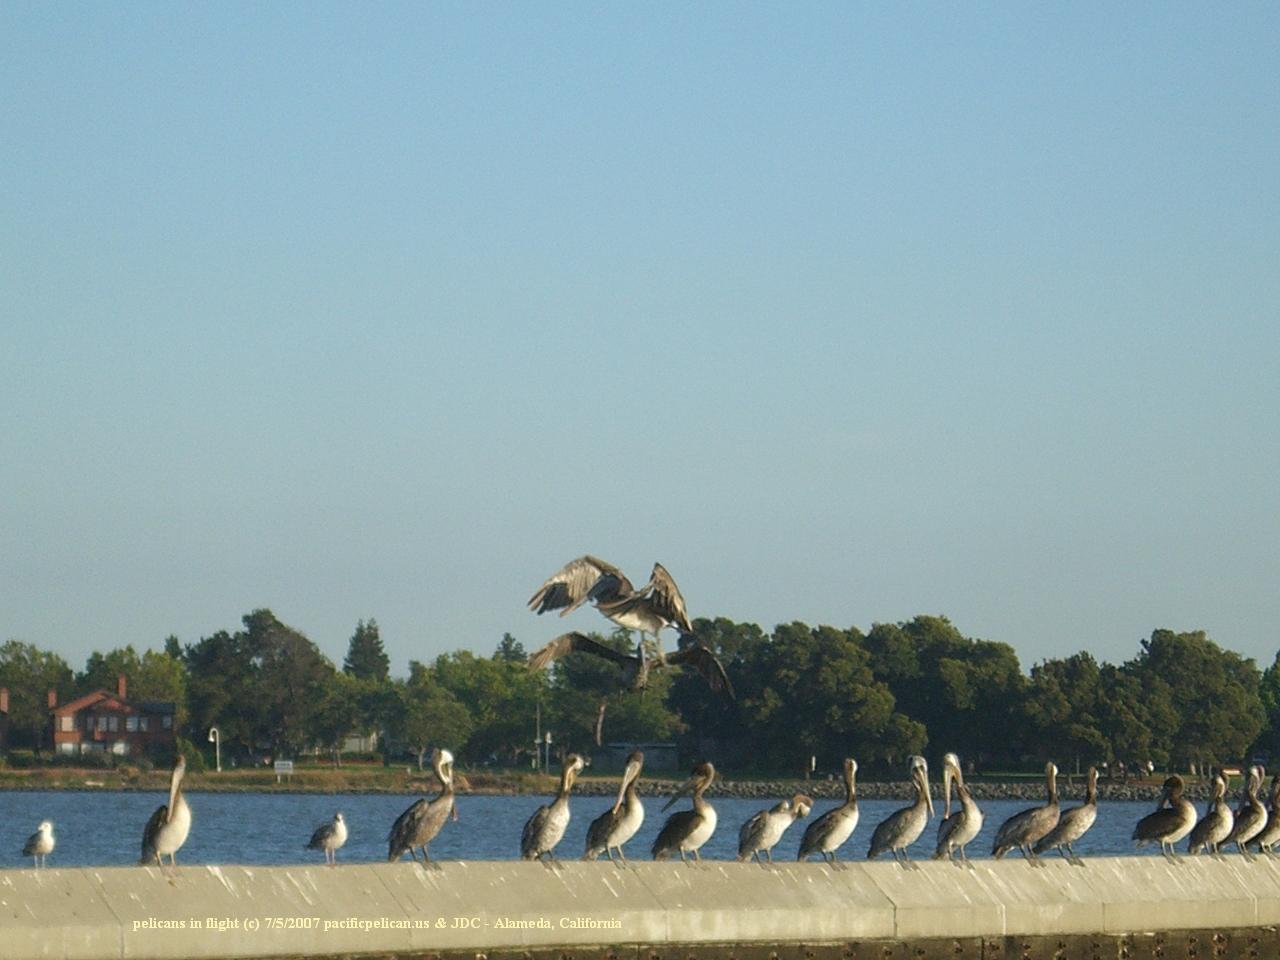 pelicans flying near Alameda, July 5, 2007